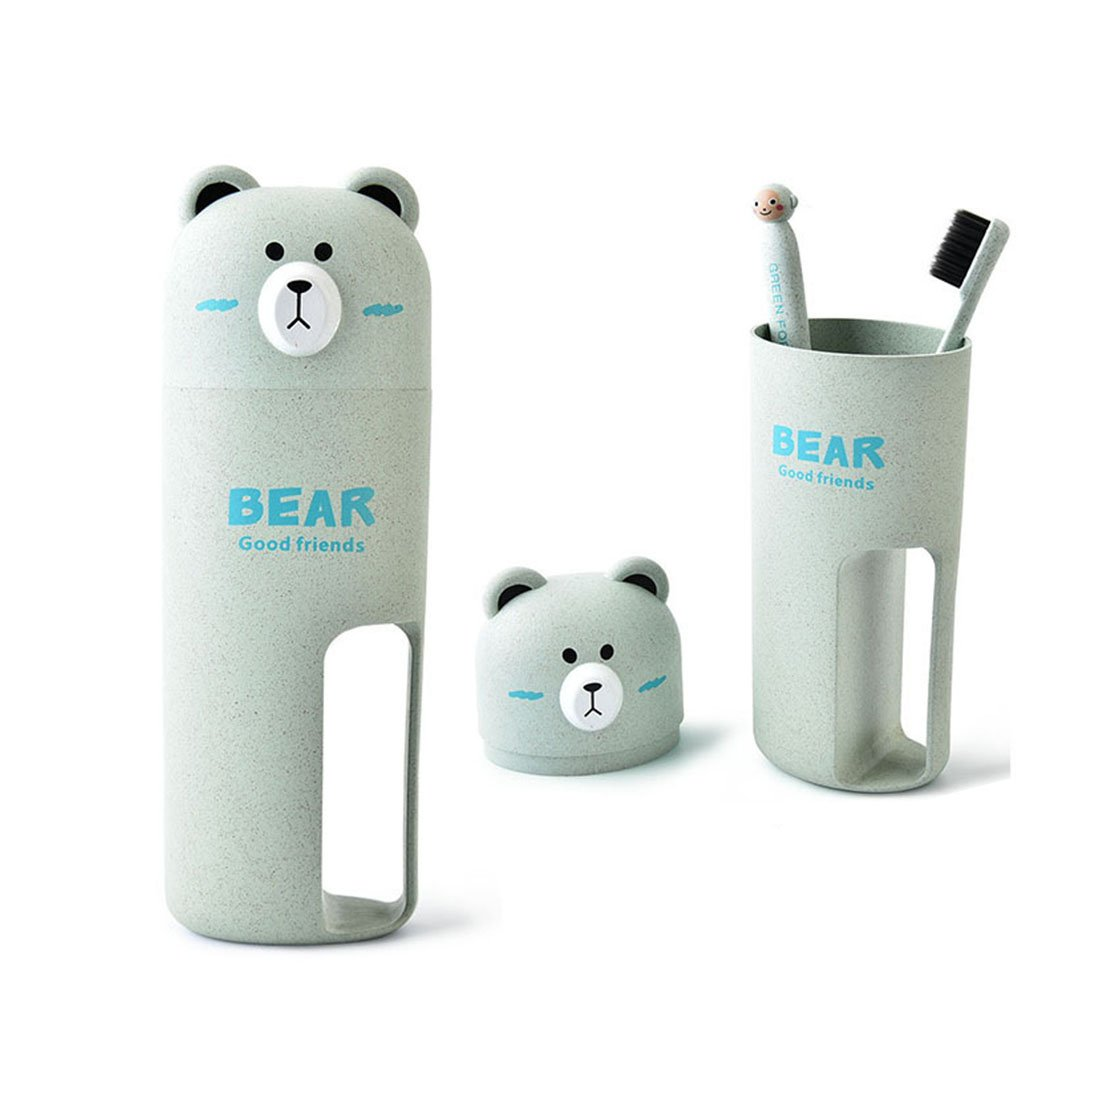 BeneKing Wash Gargle Suit Toothbrush Holder Antibacterial Travel Toothpaste Holder Case Bear-Shape Wheat Straw Plastic Portable 2 Toothbrush & 1Container Set